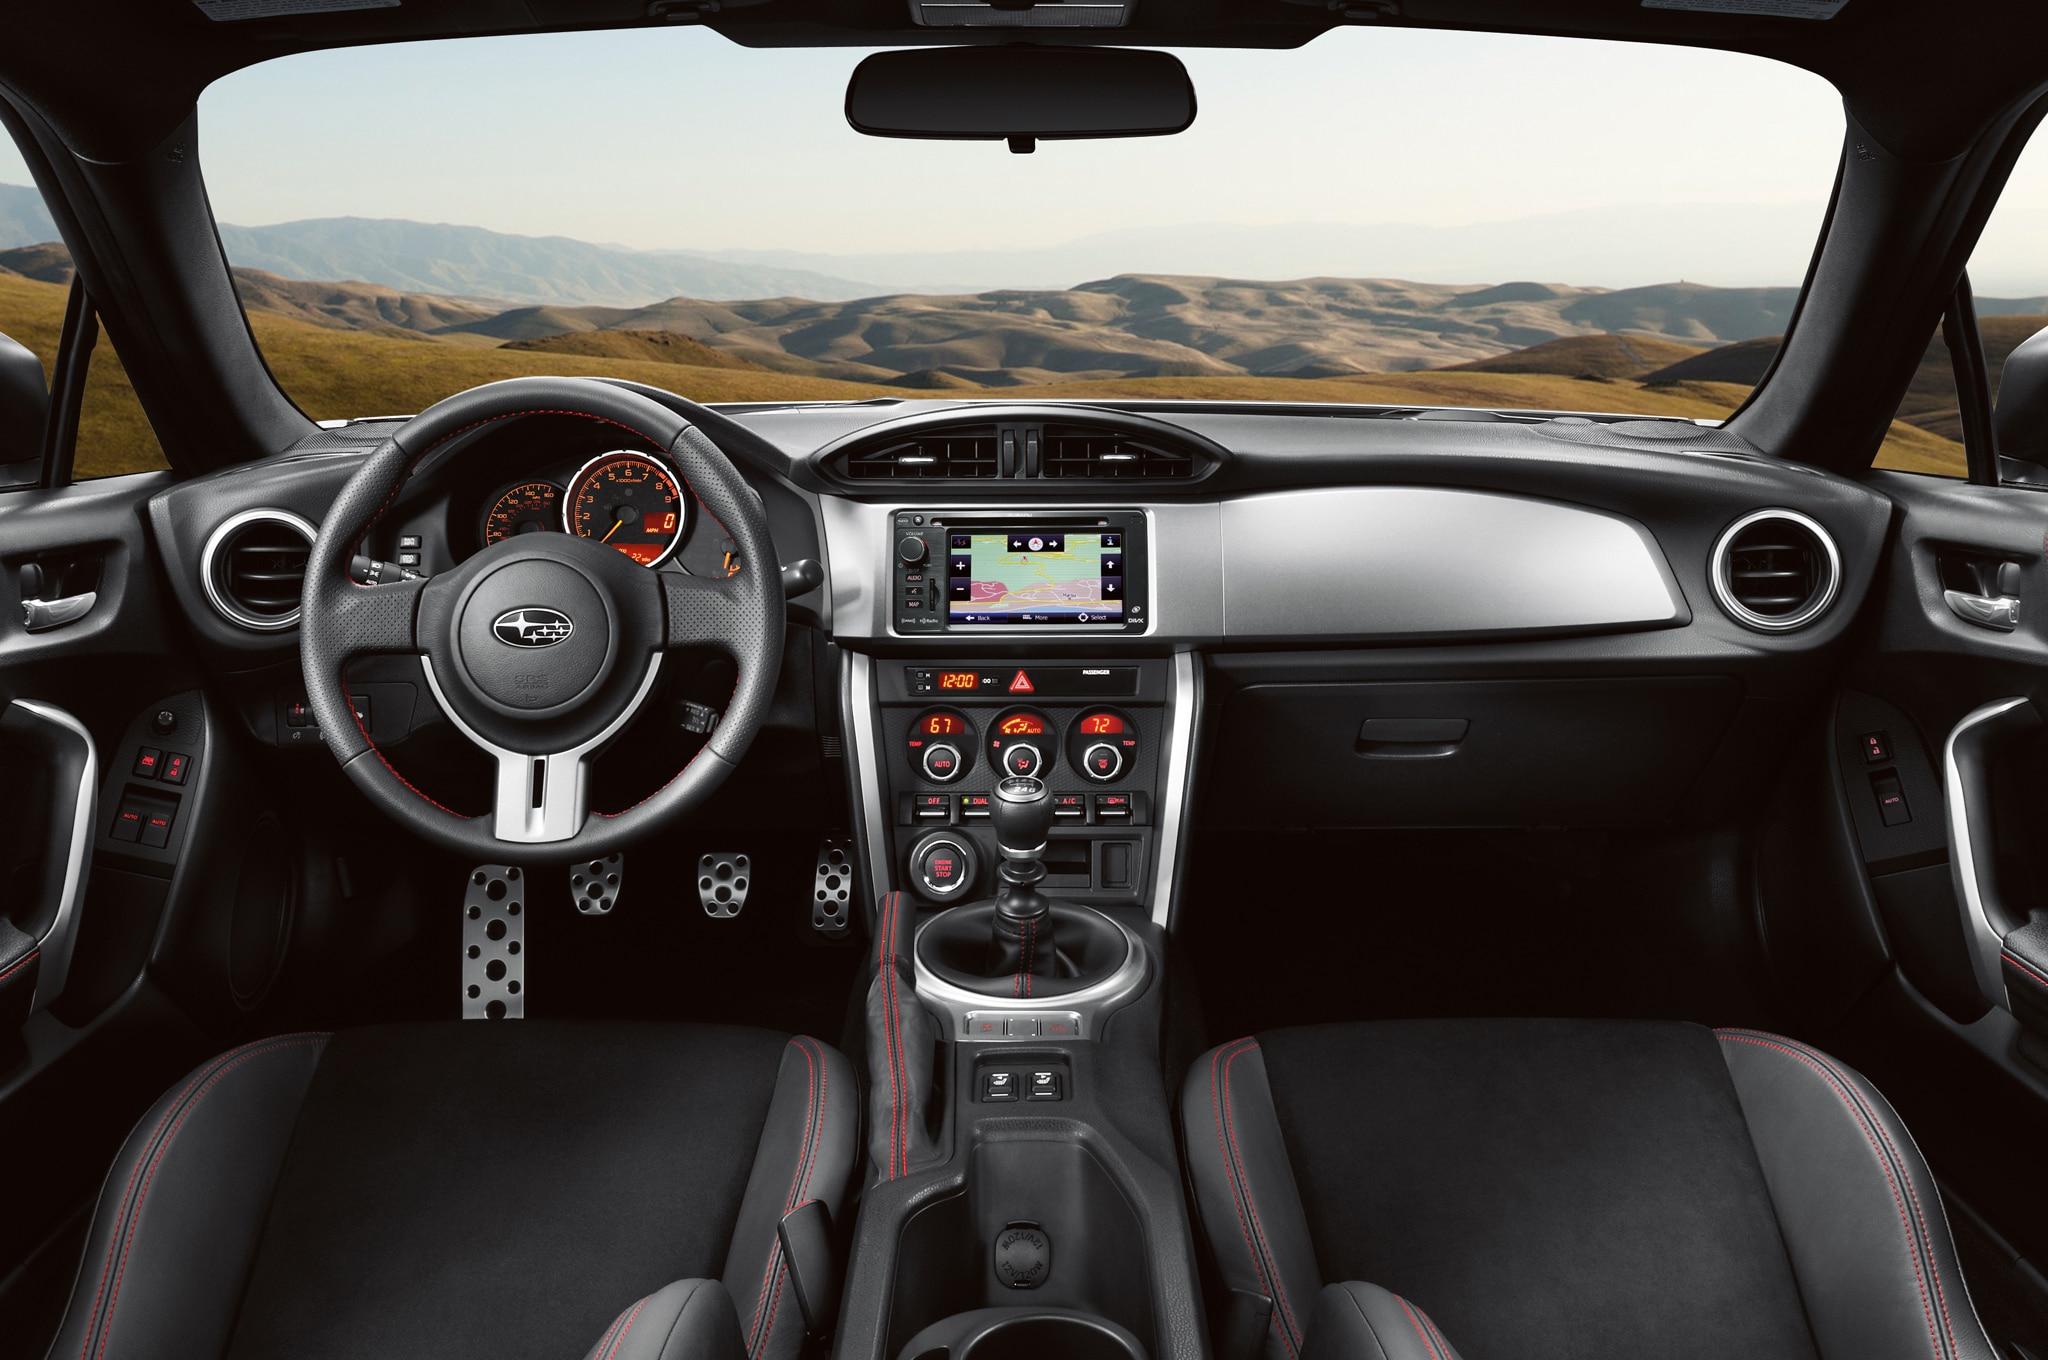 2014 Subaru Brz Priced From 26 390